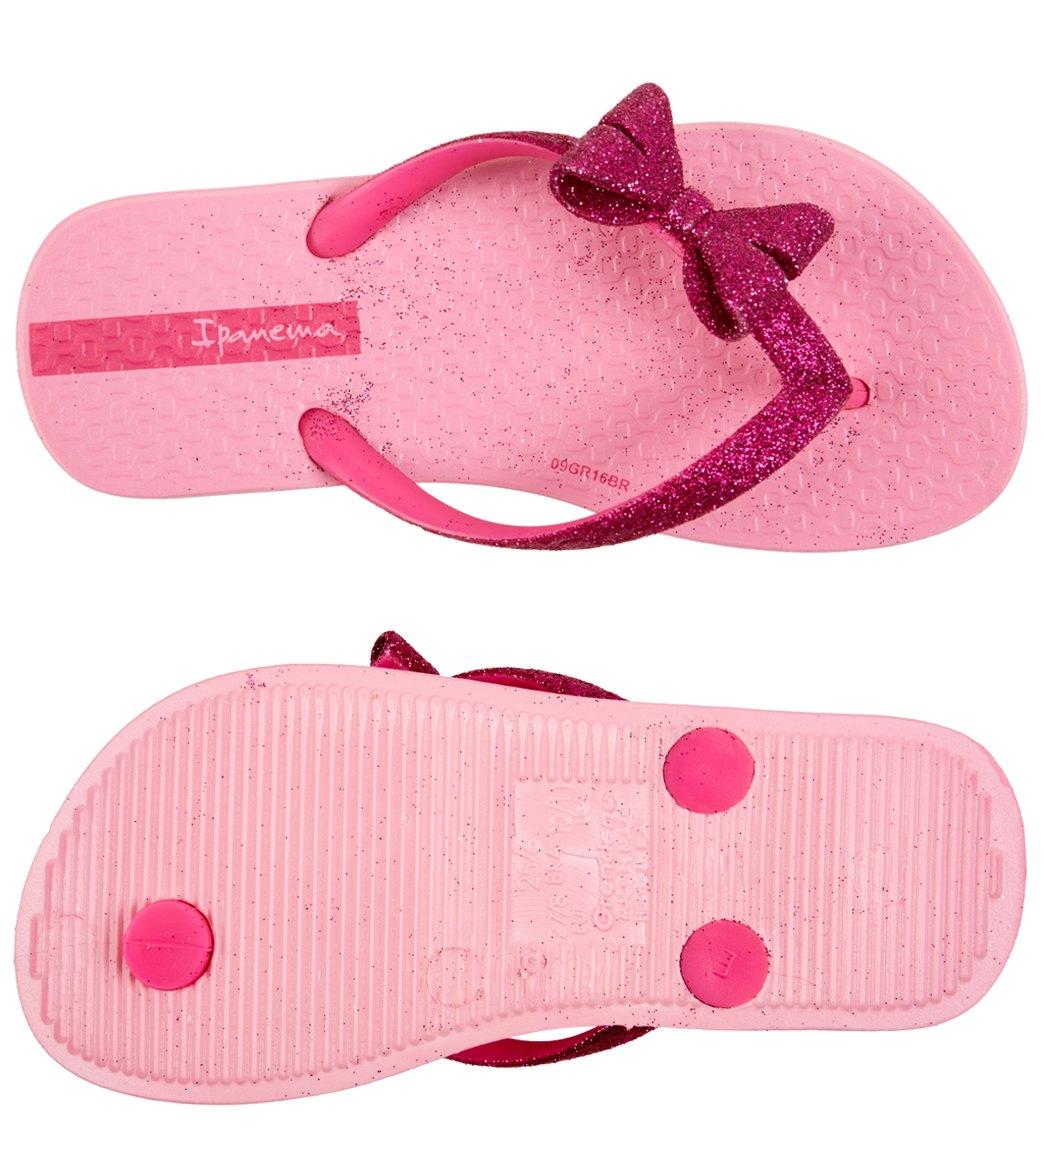 9e23147bd Ipanema Girl s Glitter Kids Sandal IV at SwimOutlet.com